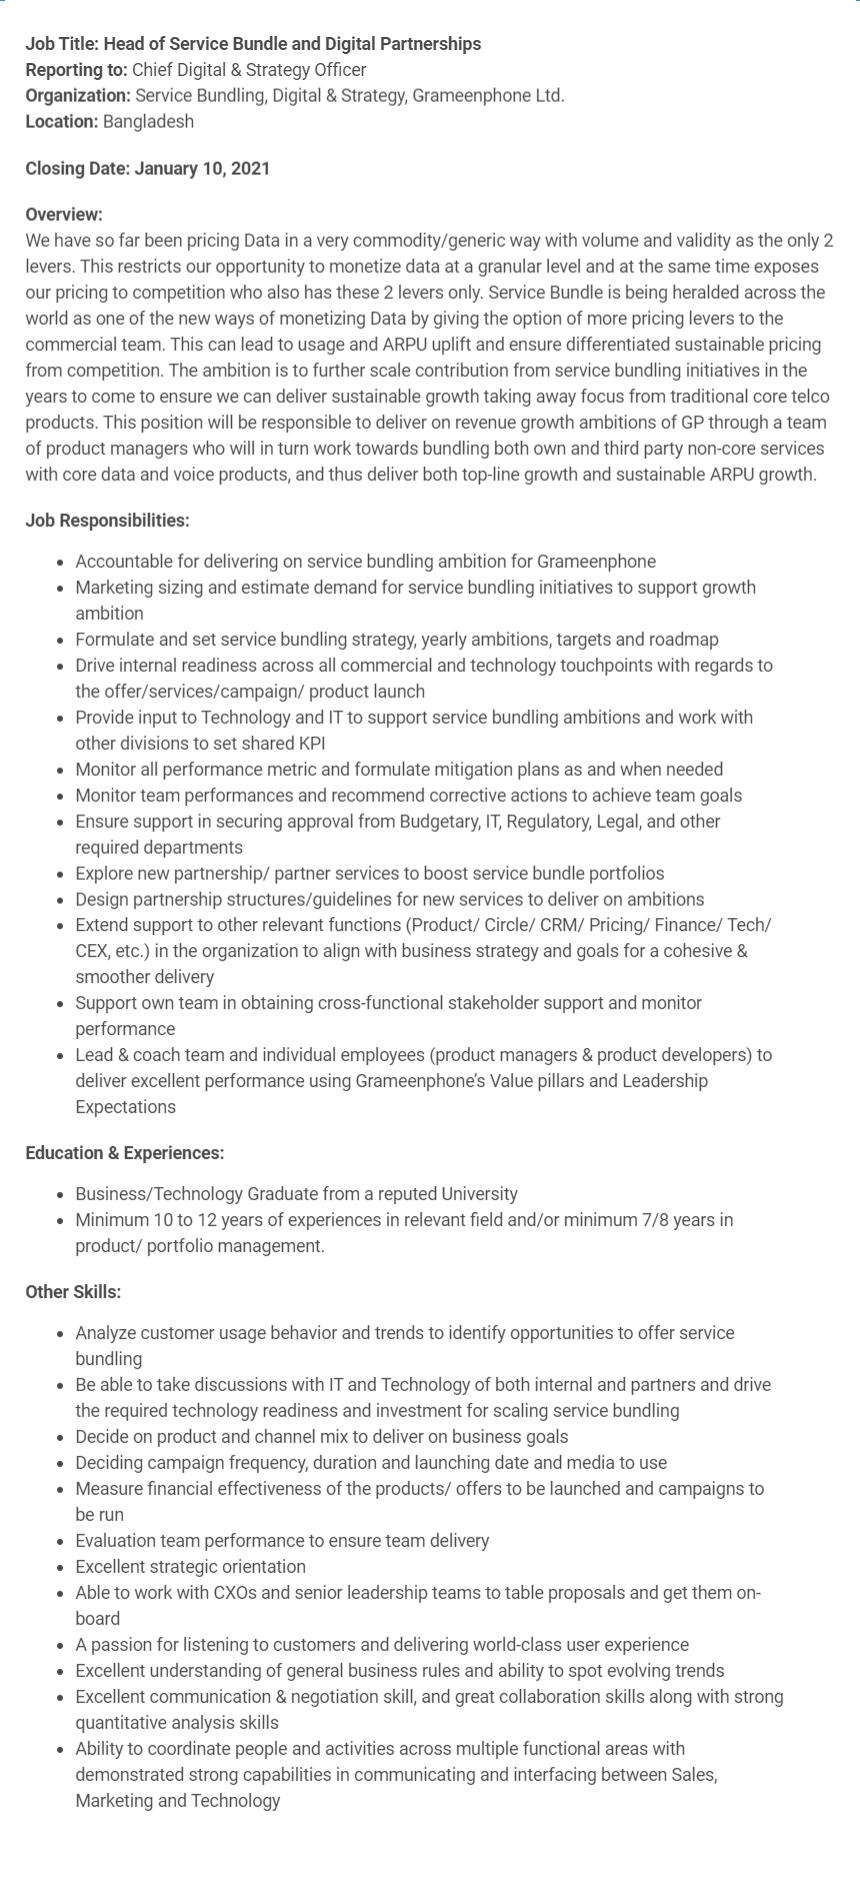 grameenphone-job-circular-2020